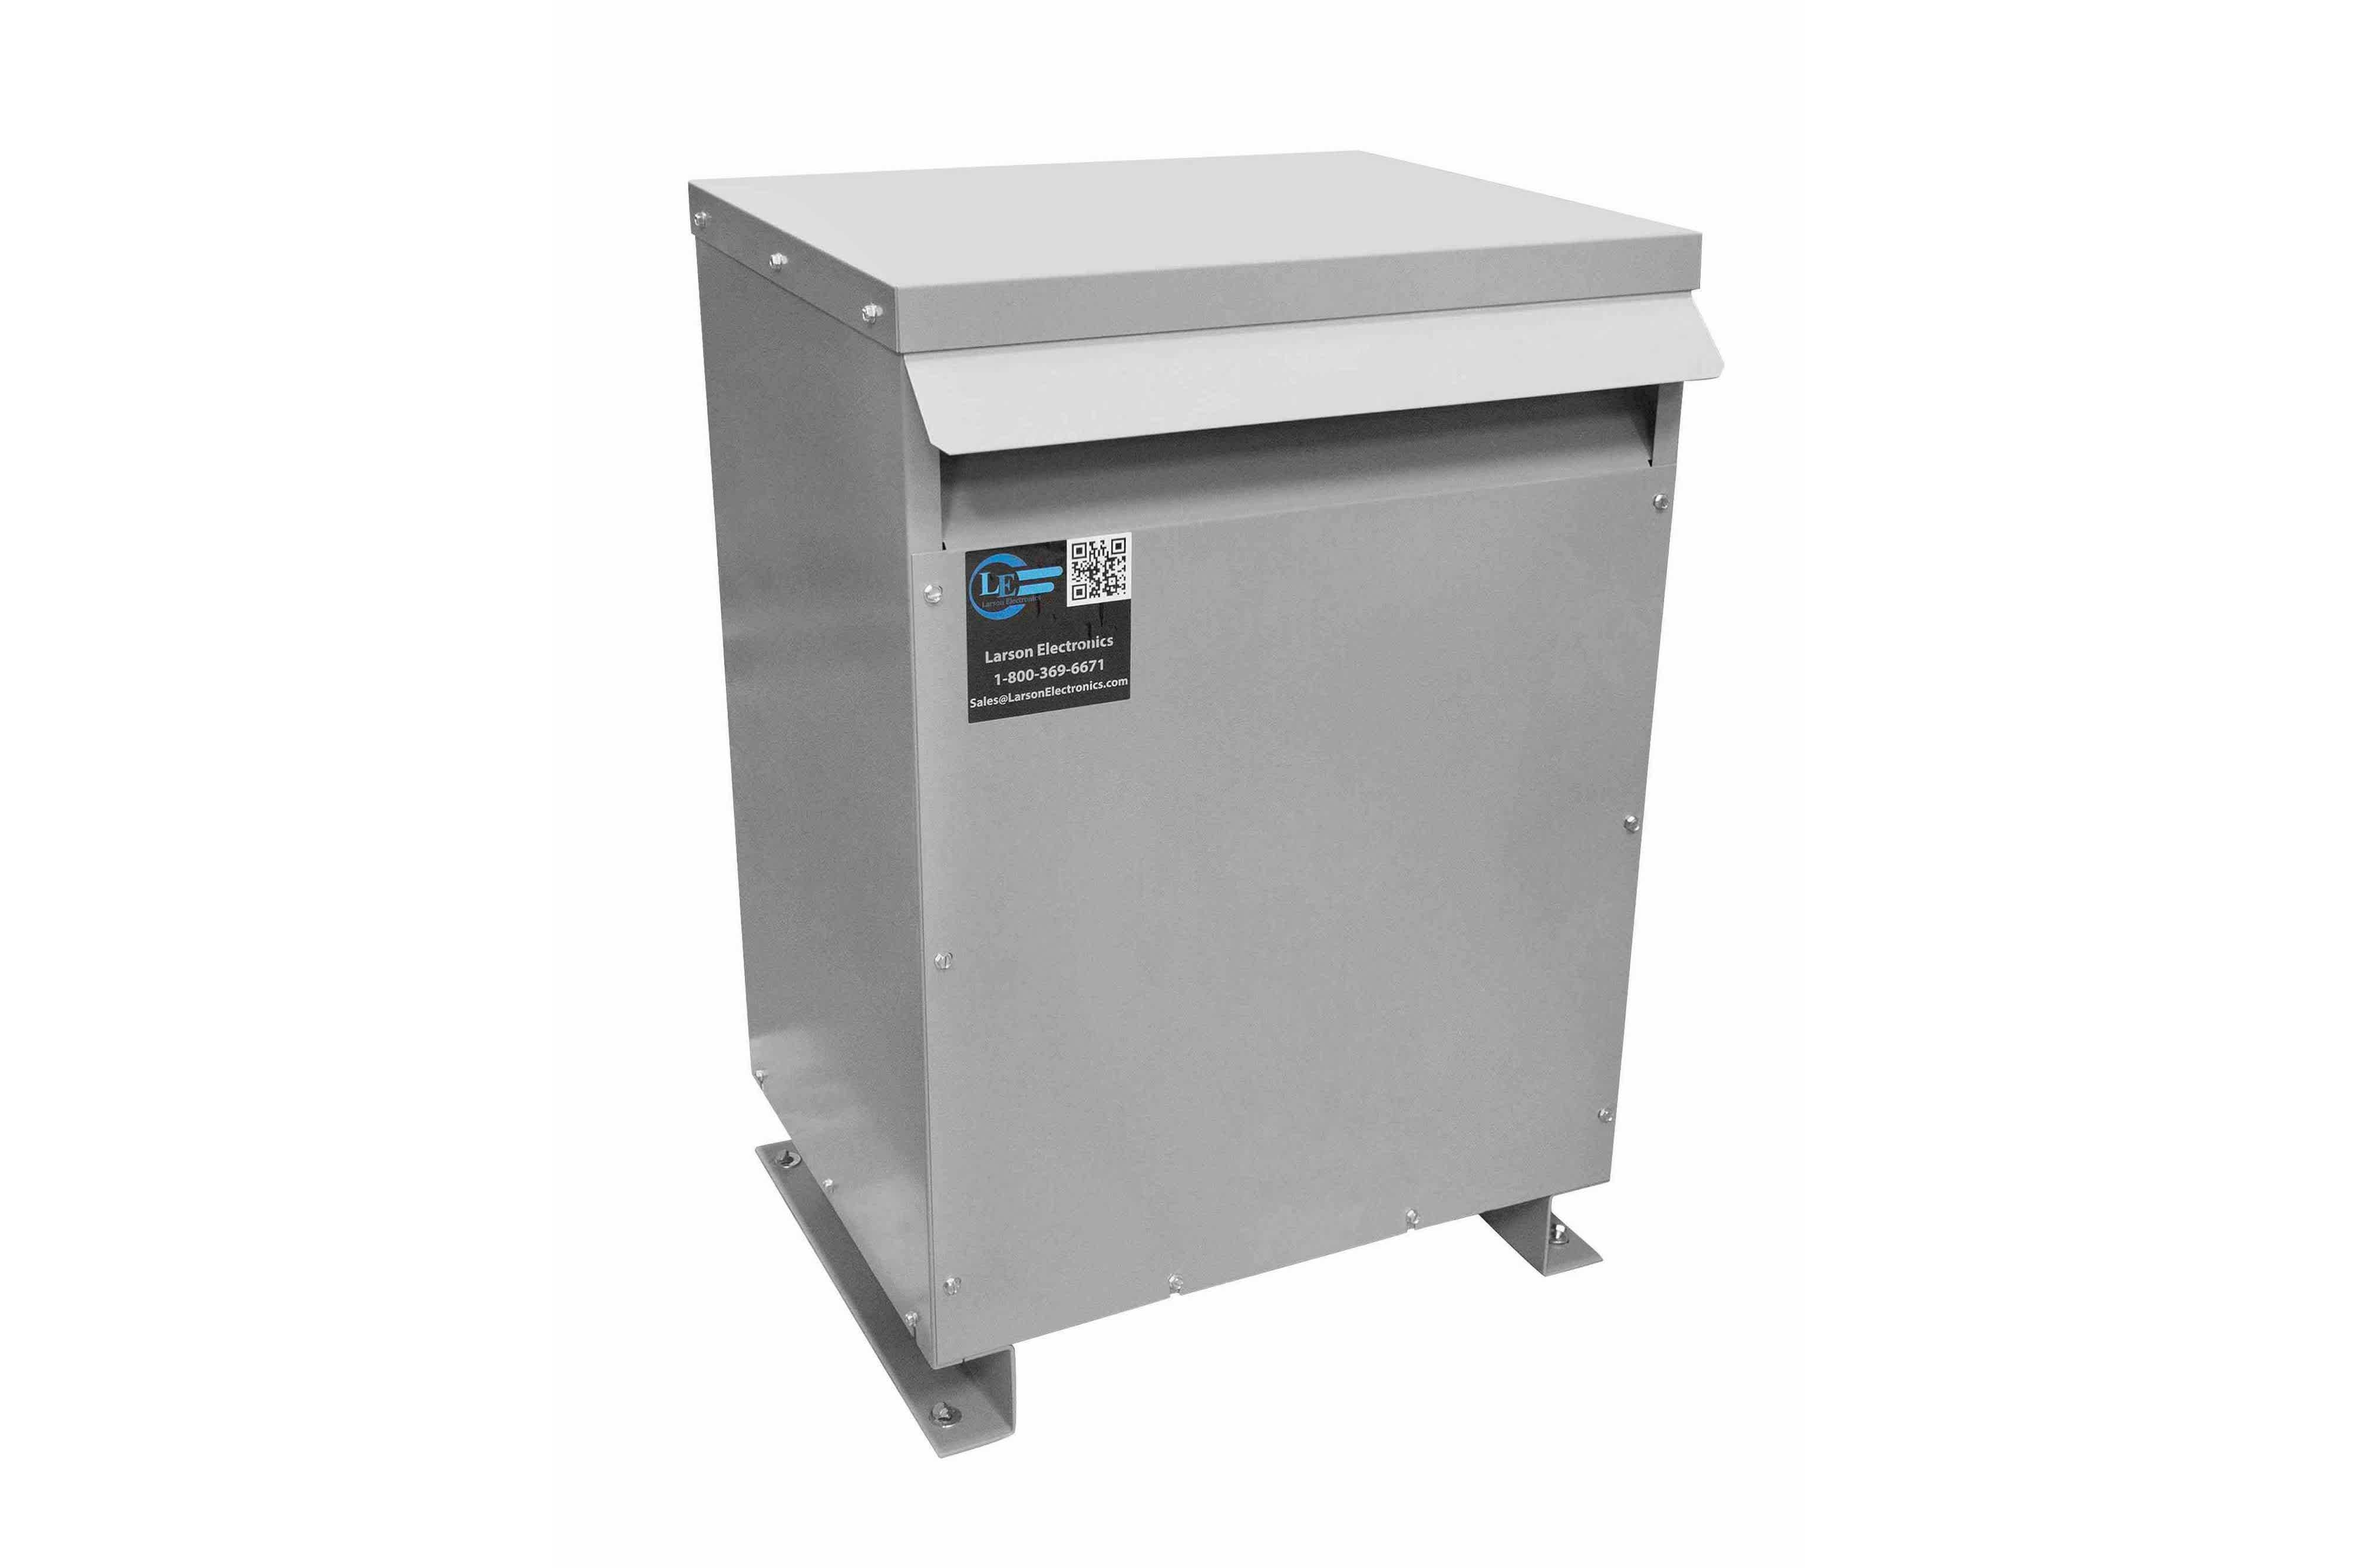 750 kVA 3PH DOE Transformer, 400V Delta Primary, 208Y/120 Wye-N Secondary, N3R, Ventilated, 60 Hz